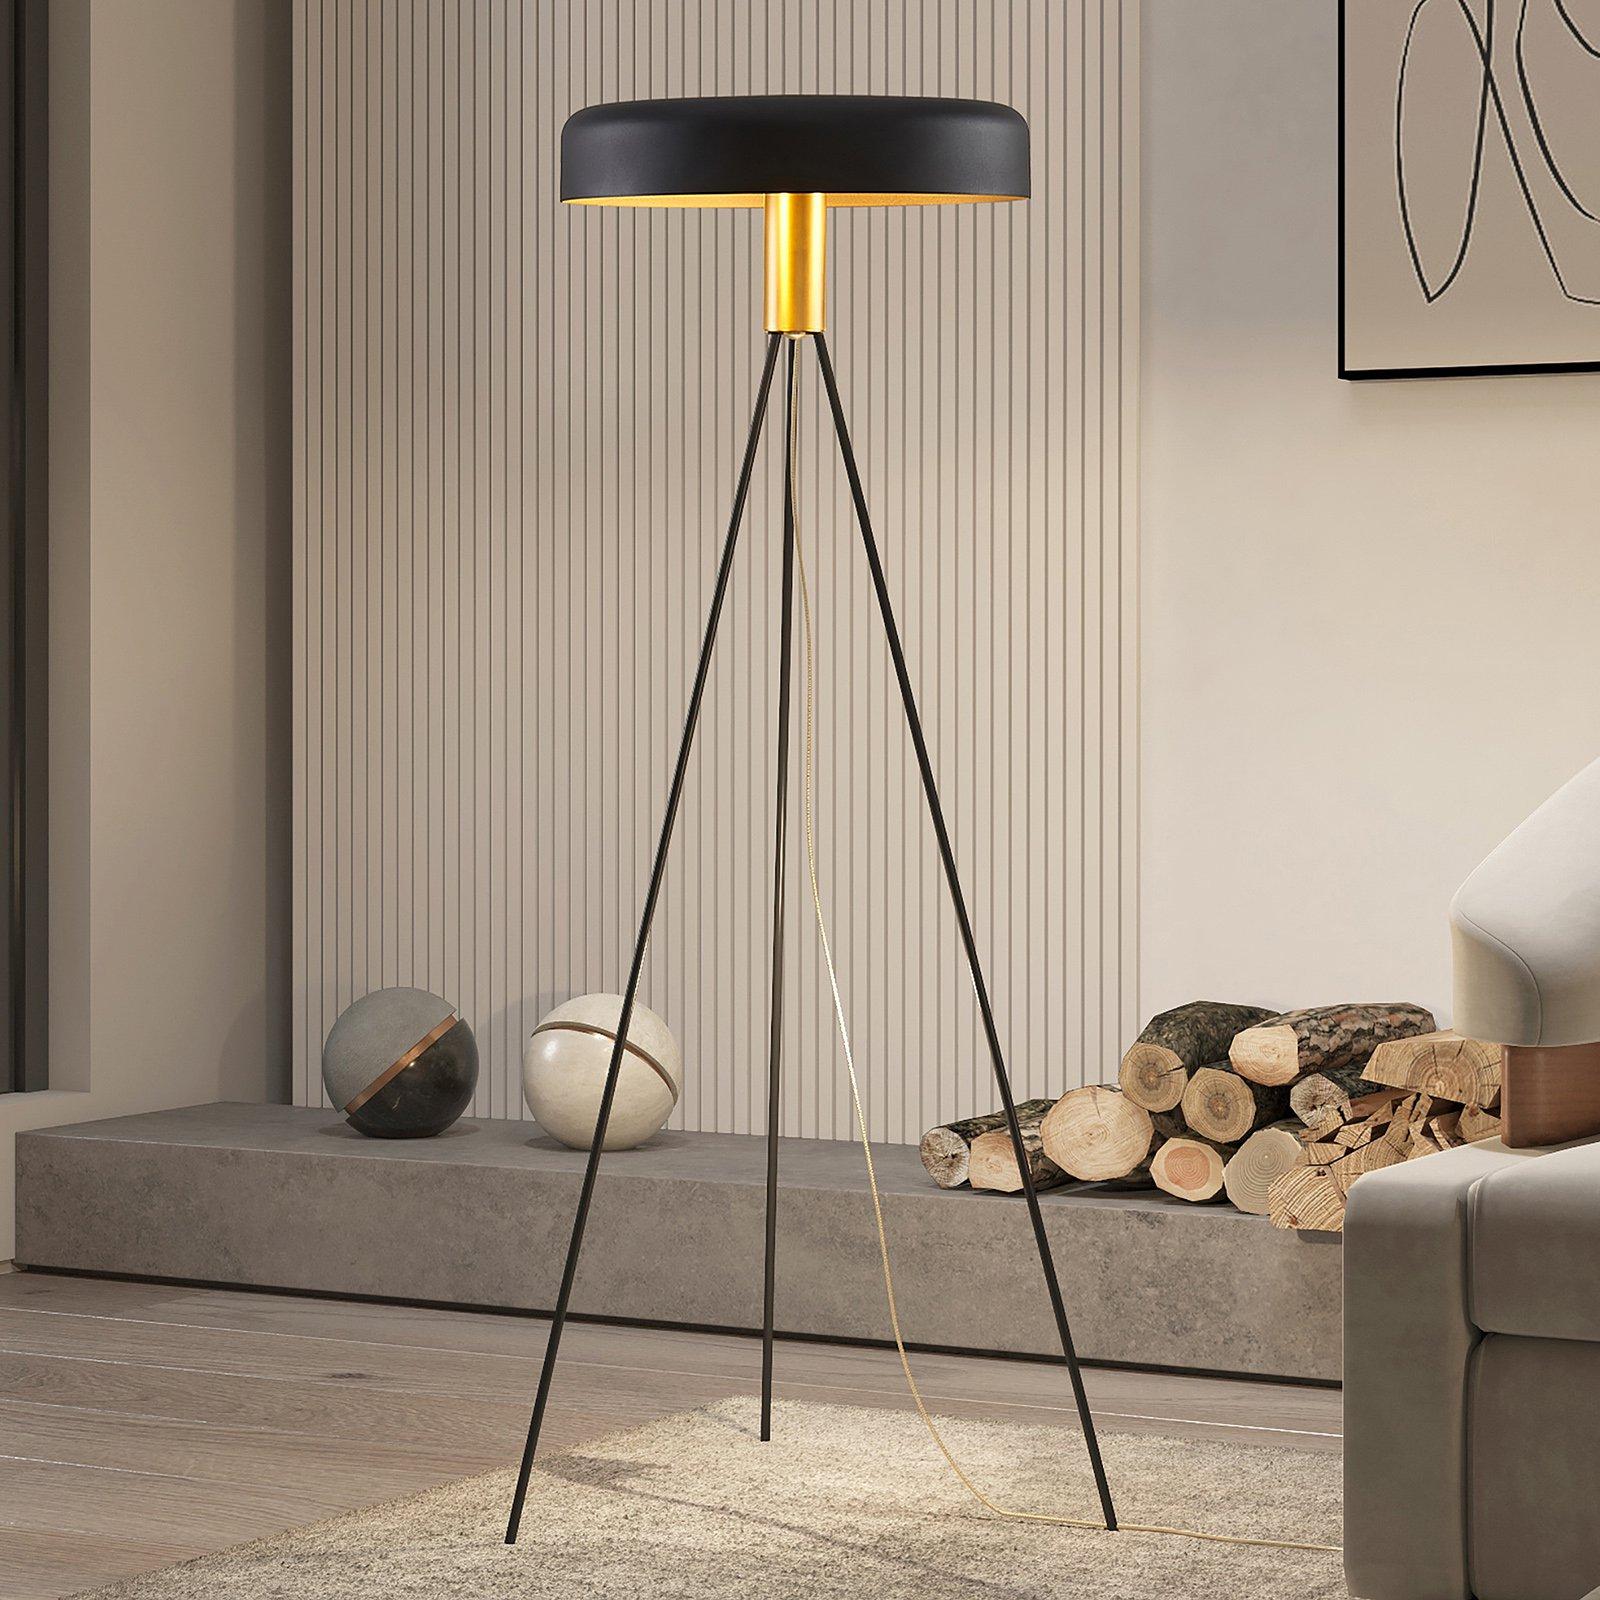 Lucande Filoreta gulvlampe i svart